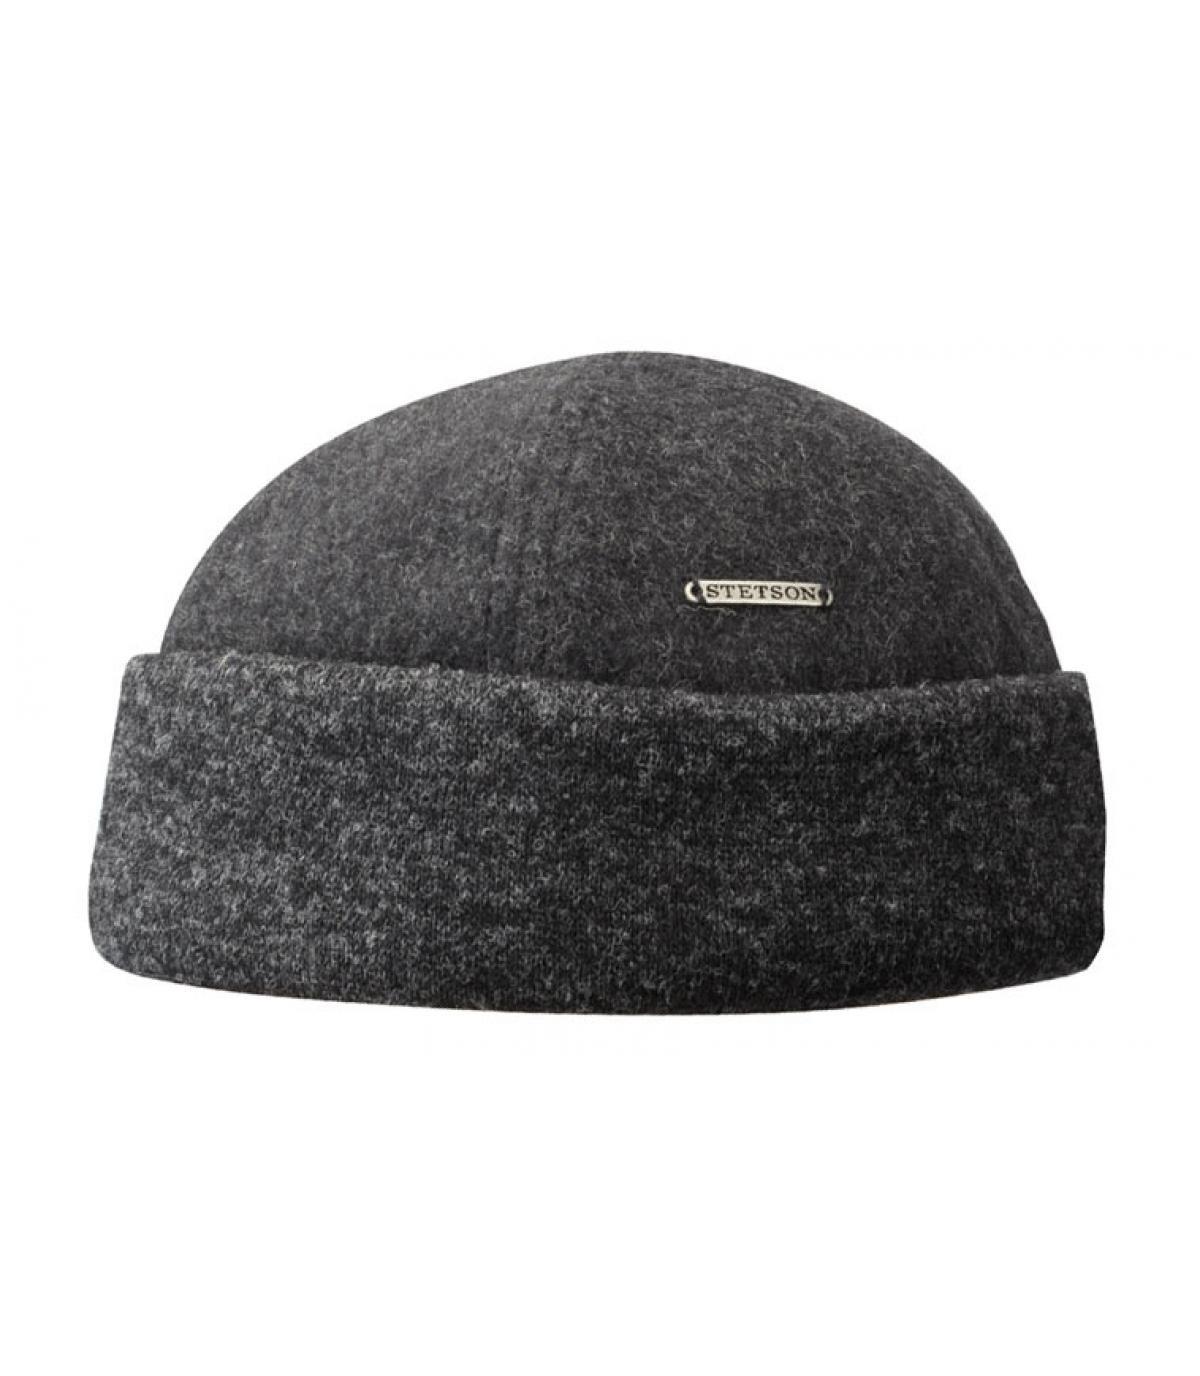 Details Docker Wool Cashmere grey - Abbildung 2